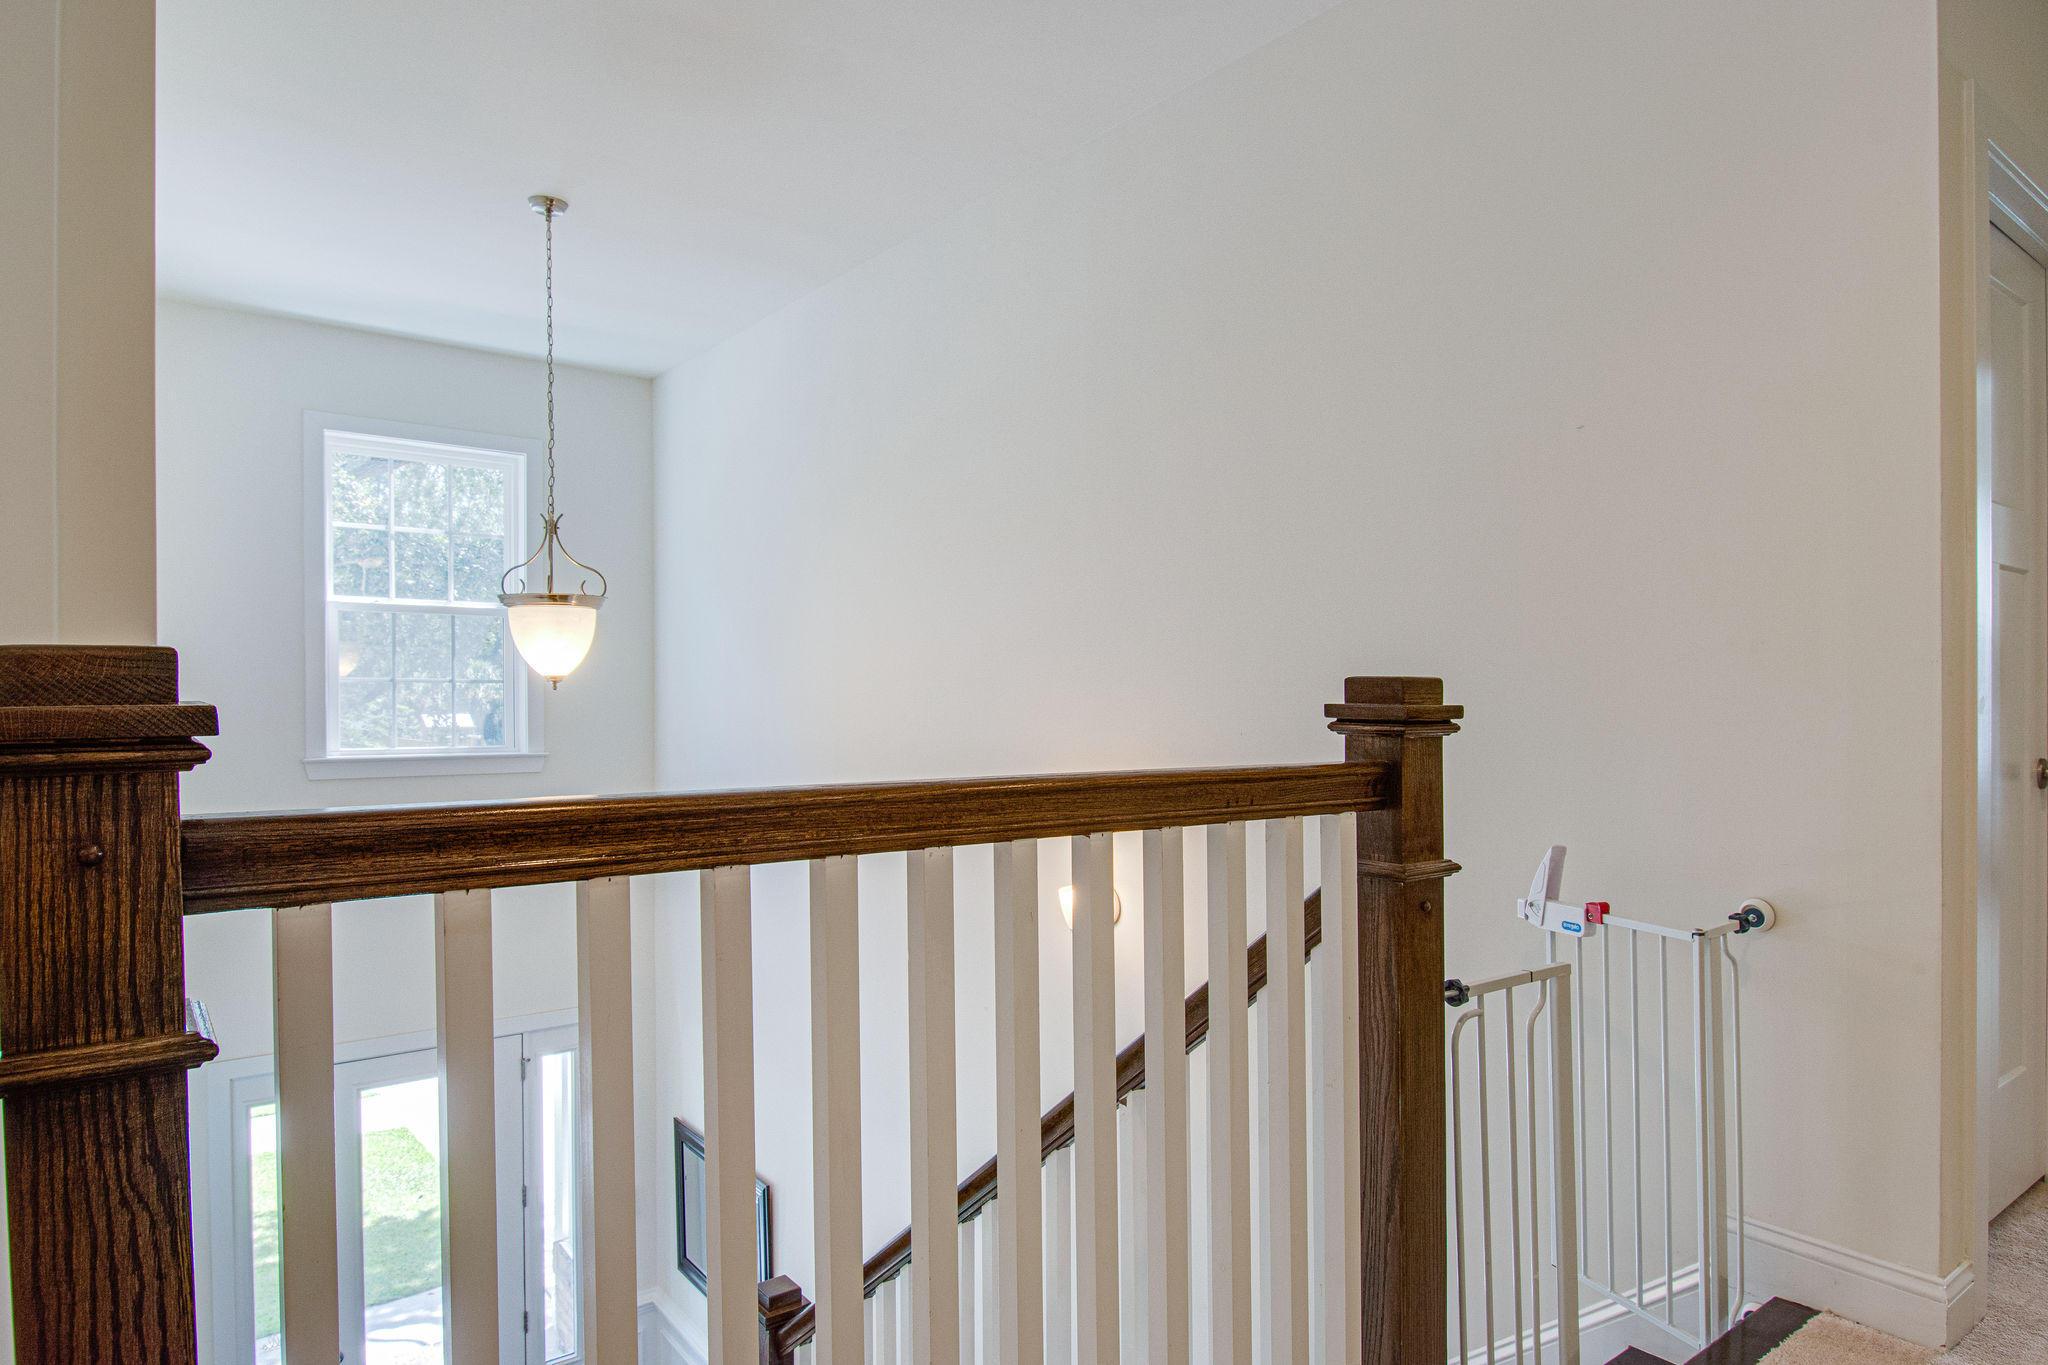 Magnolia Village Homes For Sale - 1261 Pearwood, Mount Pleasant, SC - 12